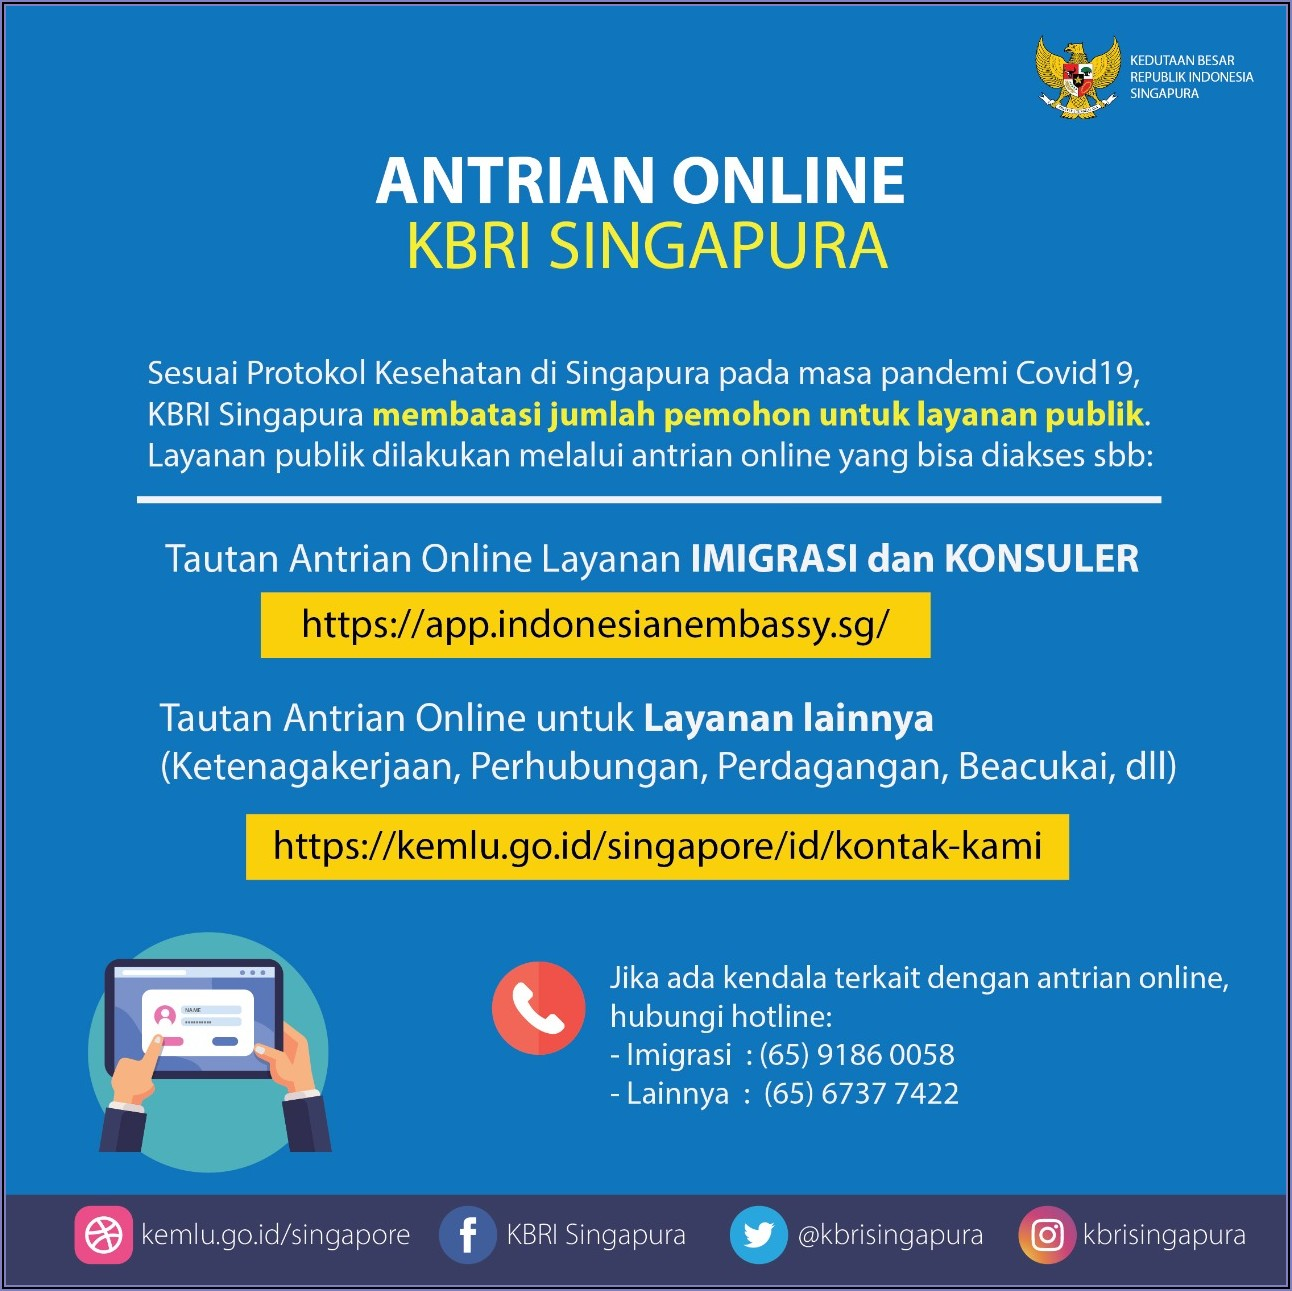 Www.bdhc.sg Passport Renewal Form